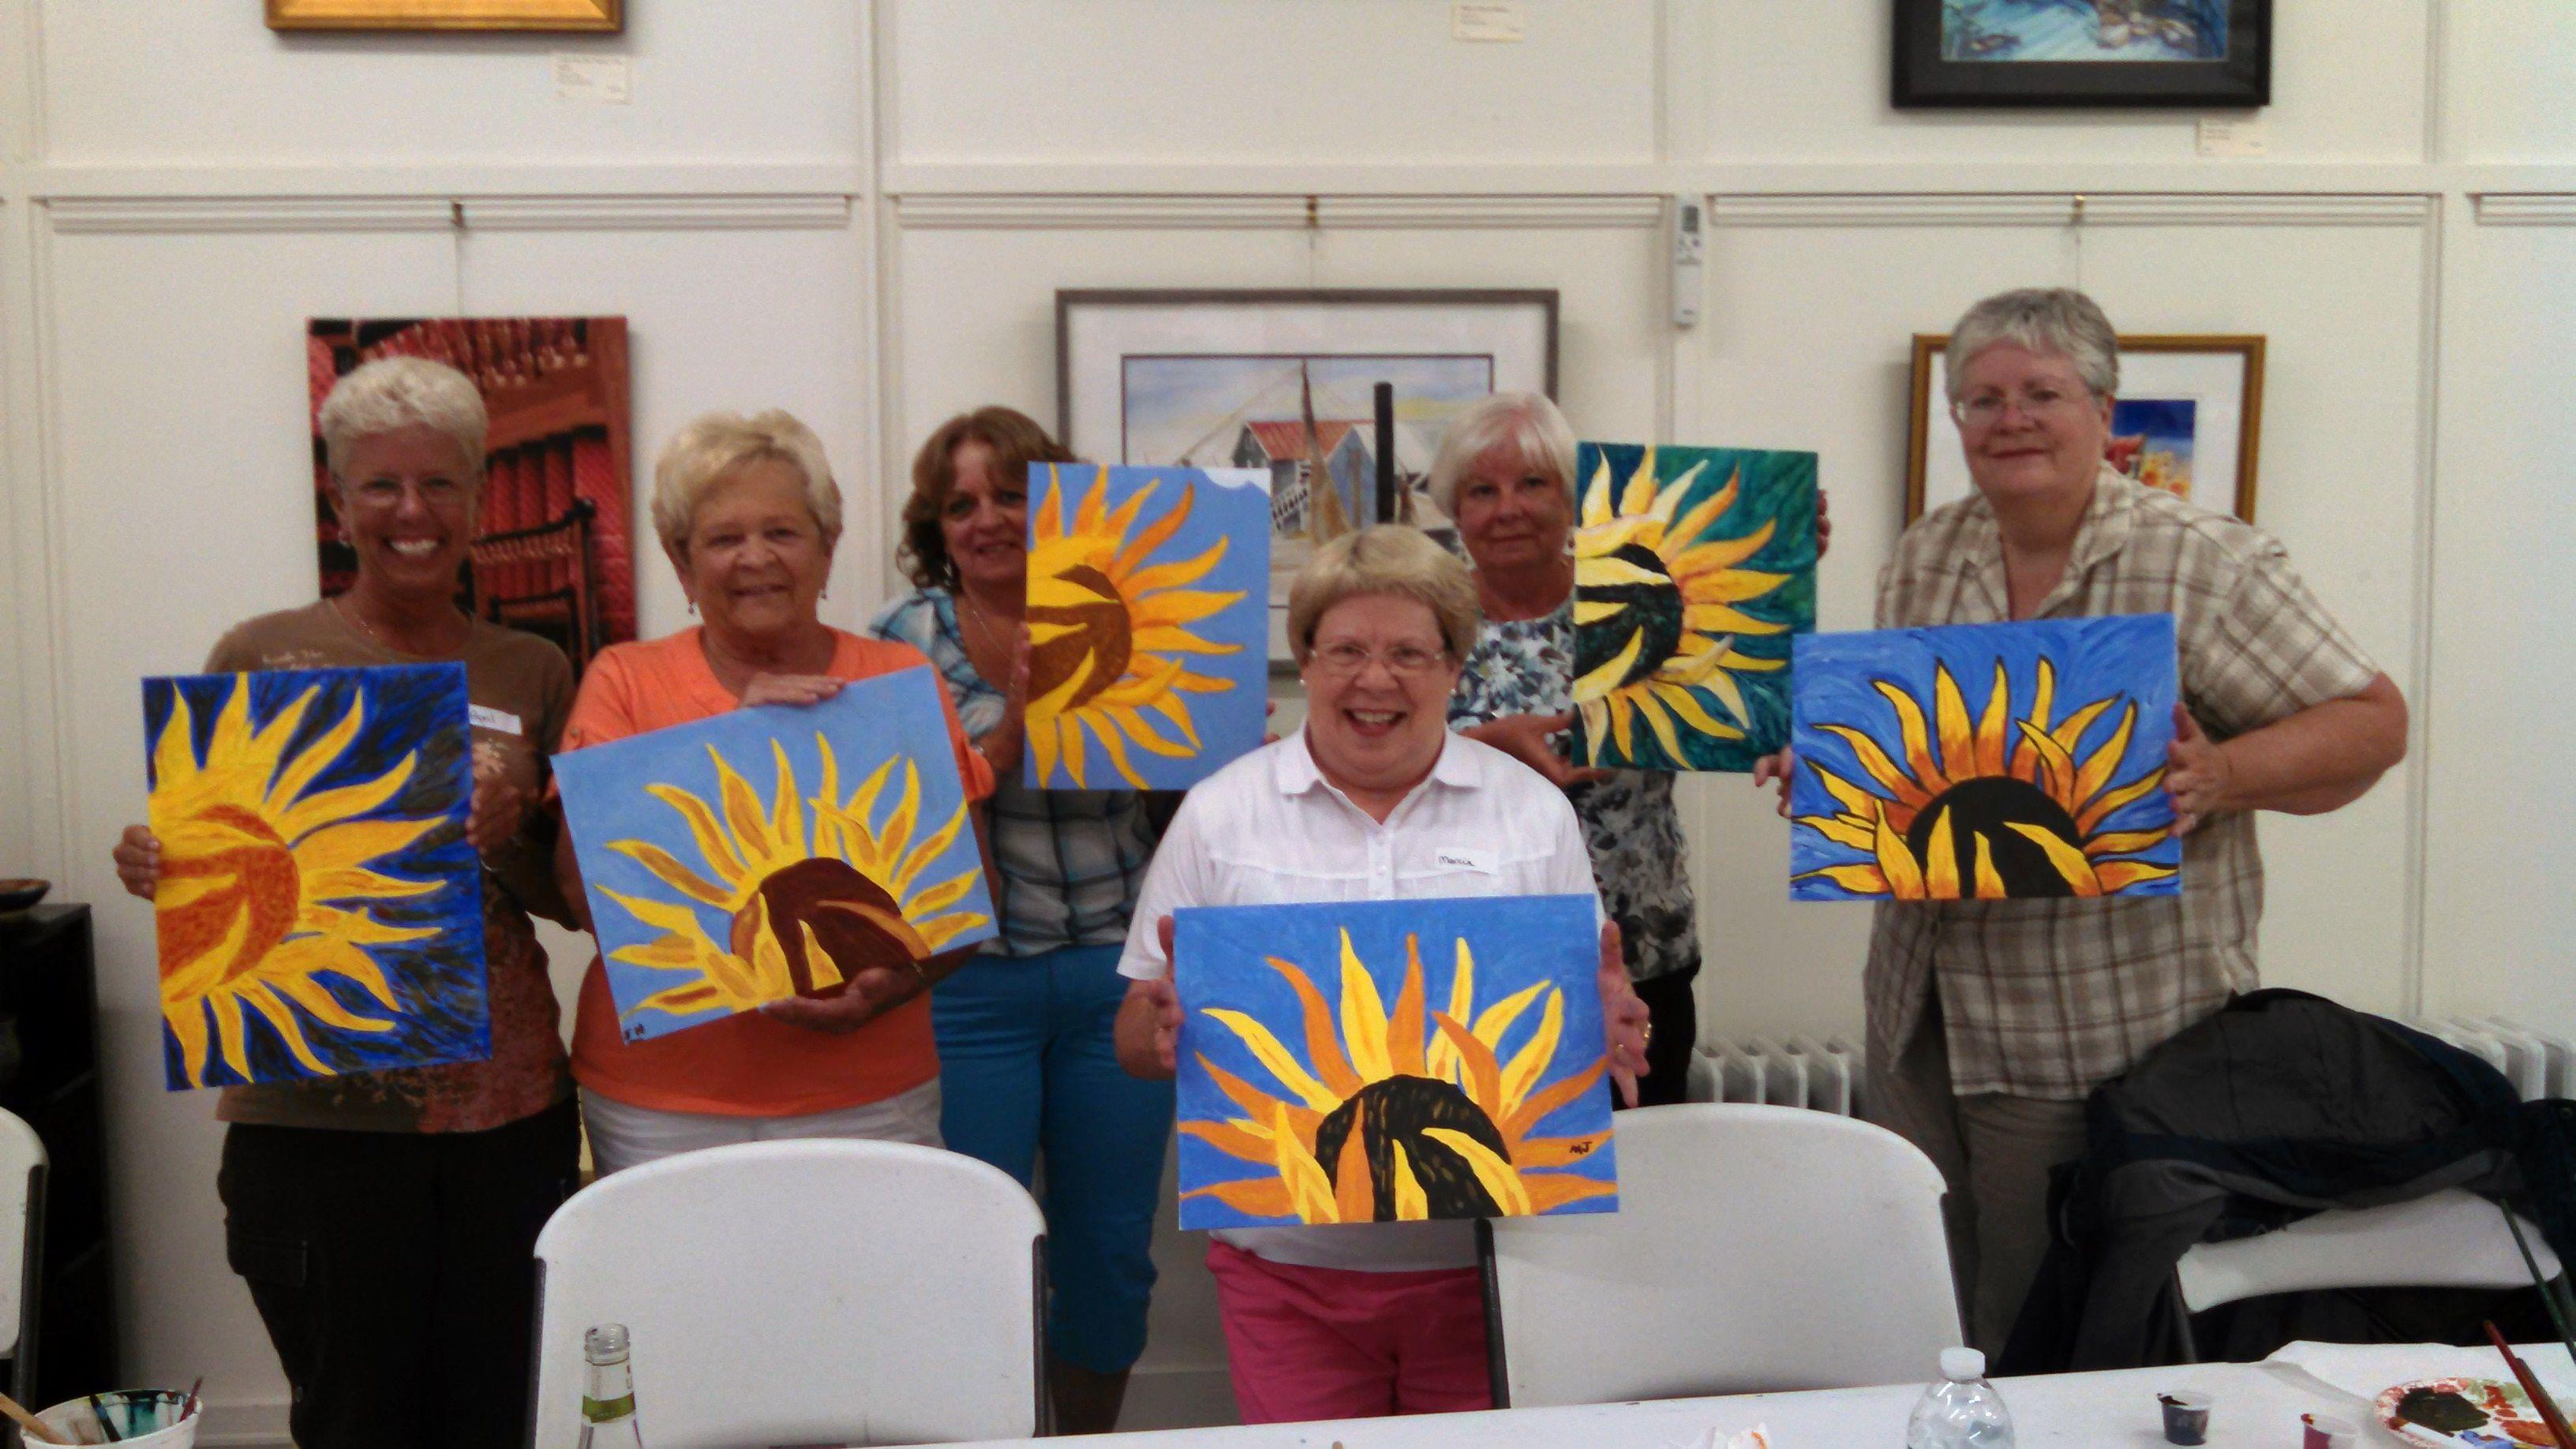 Blush & Brush Sunflower - Bay School Community Arts Center